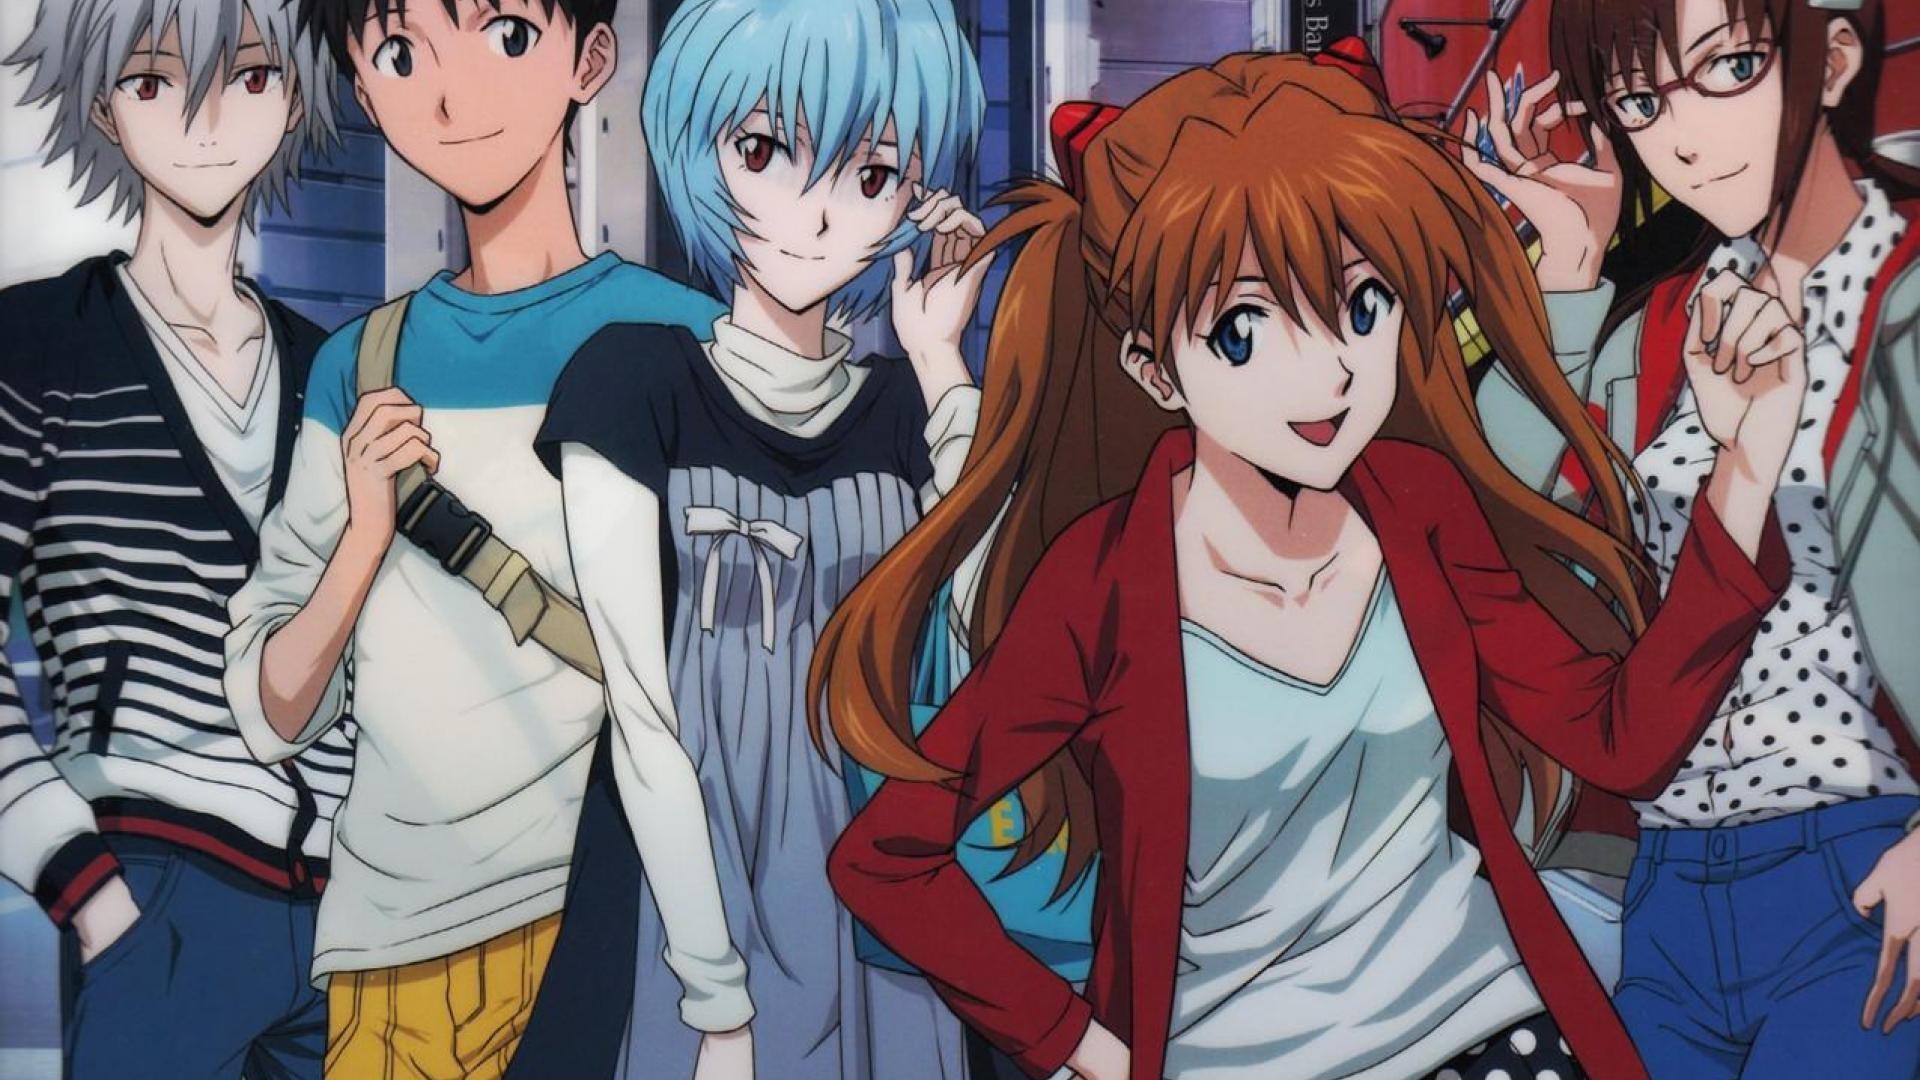 Anime 1920x1080 Neon Genesis Evangelion Asuka Langley Soryu Ayanami Rei Ikari Shinji anime Makinami Mari Illustrious